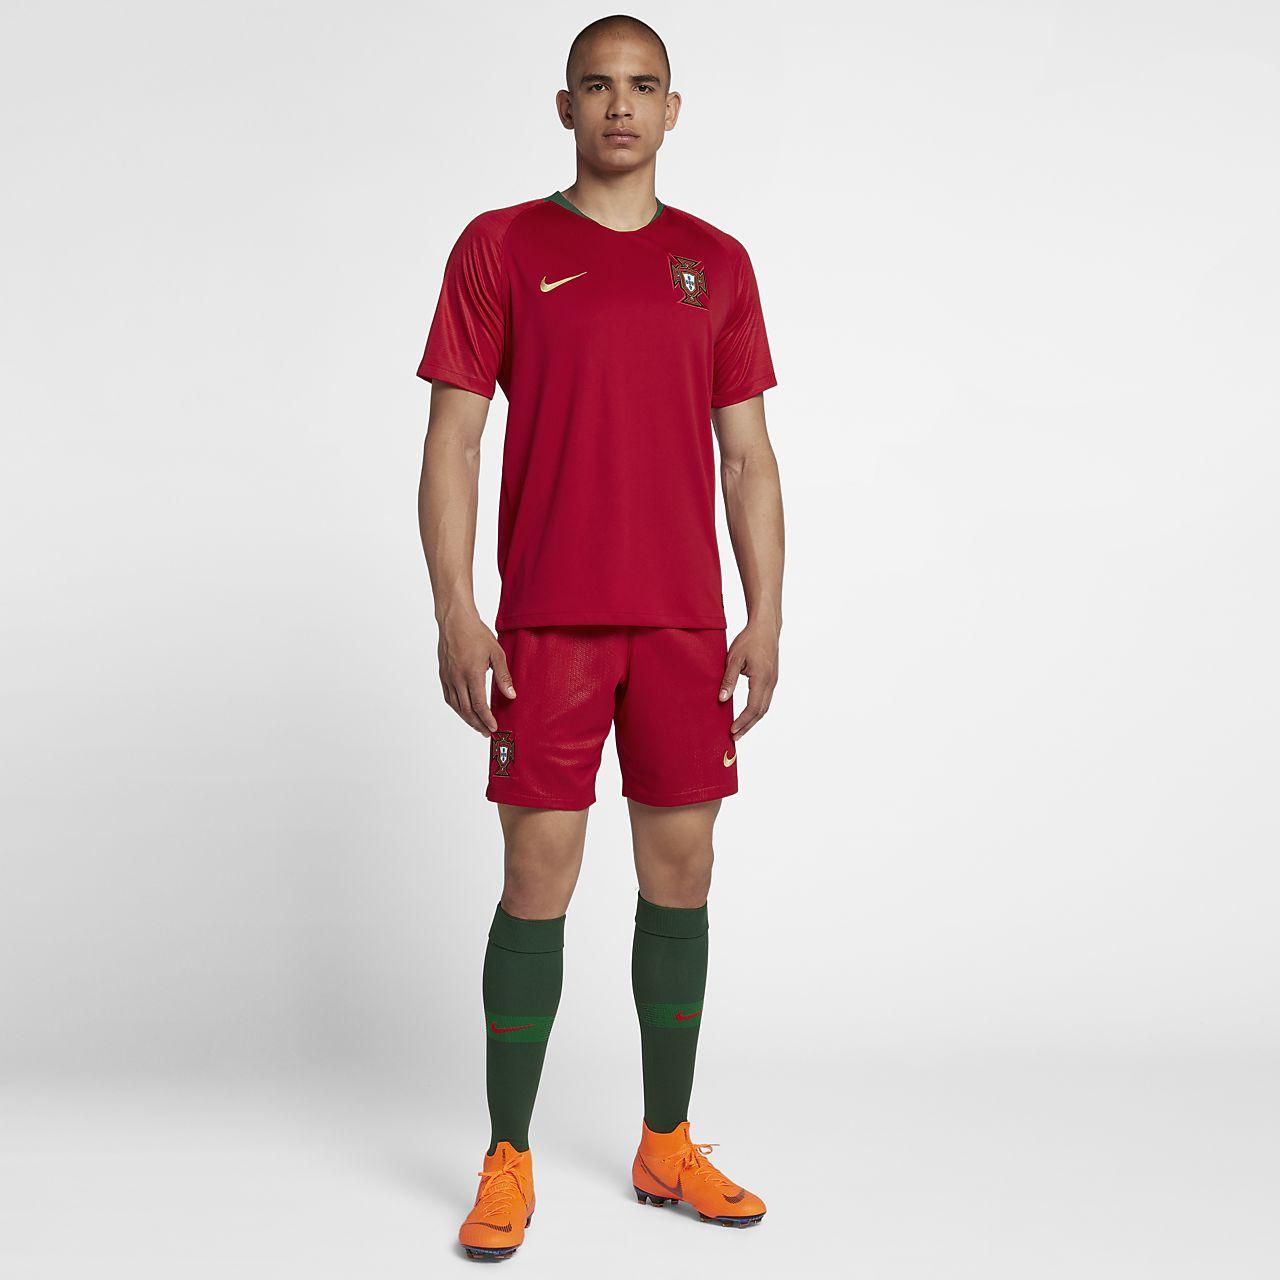 abce037e4 2018 Portugal Stadium Home Men's Football Shorts. Nike.com IL